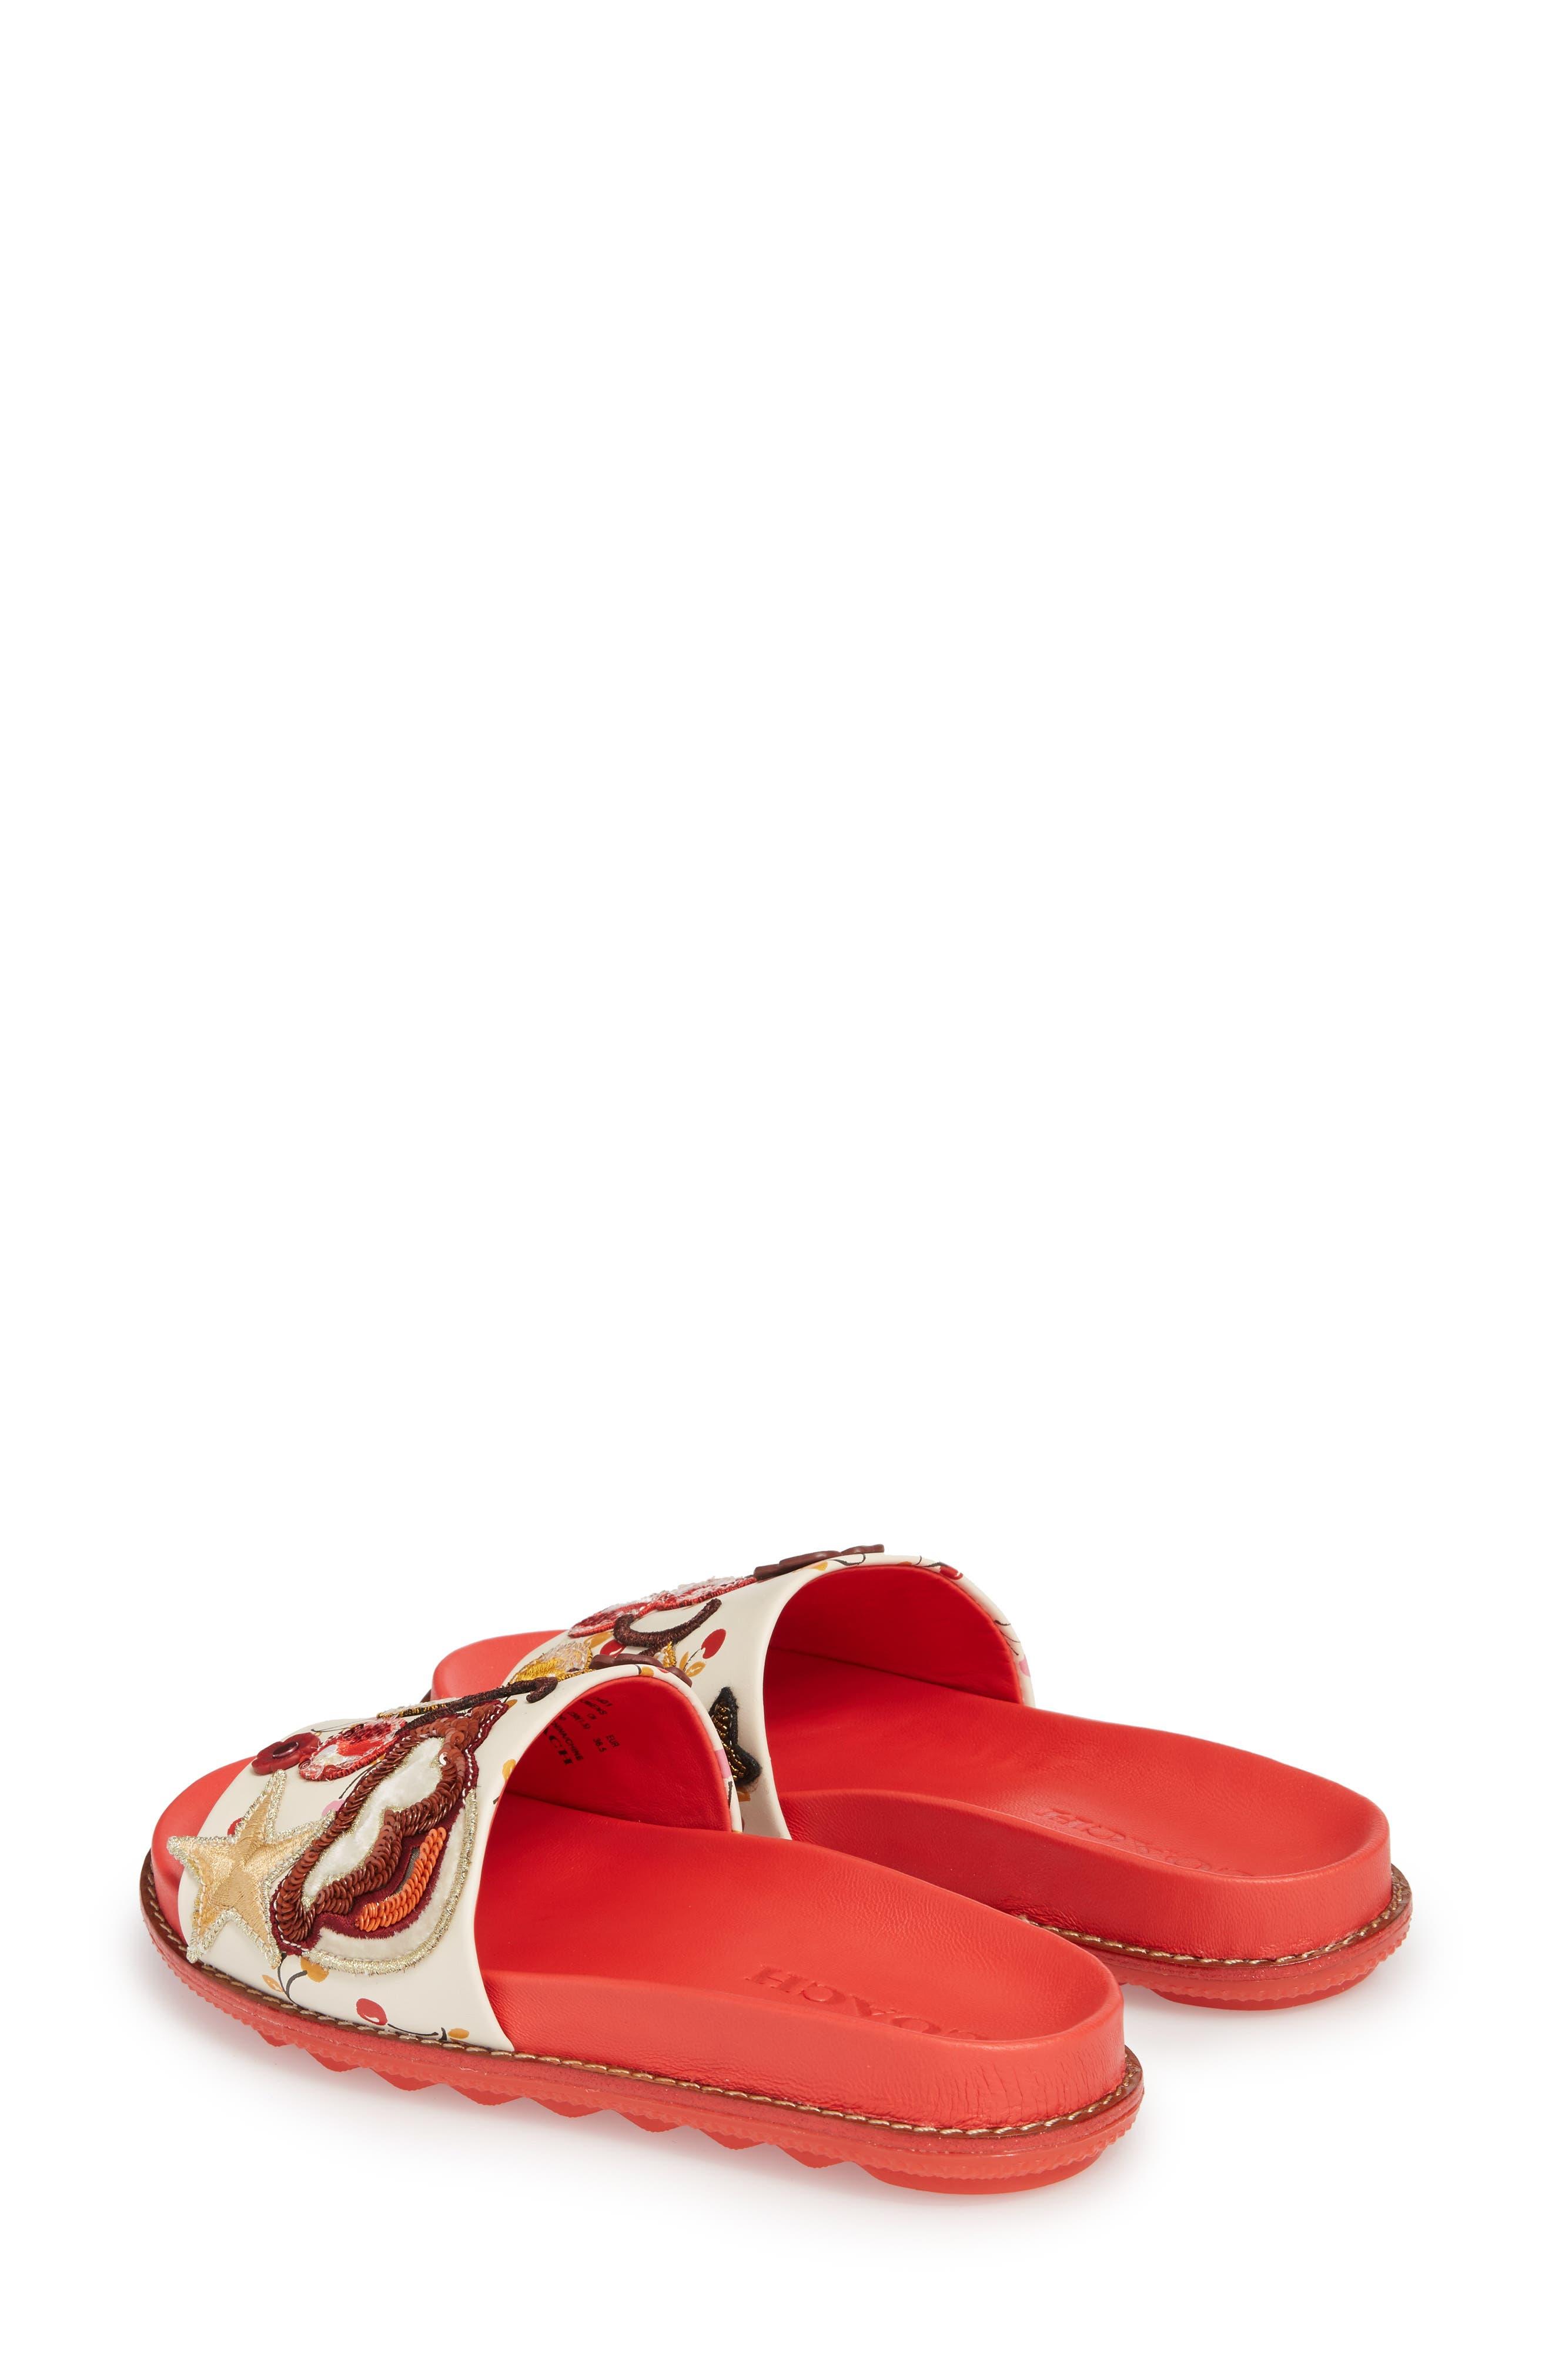 Patch Sport Slide Sandal,                             Alternate thumbnail 2, color,                             Ivory/ Red Leather